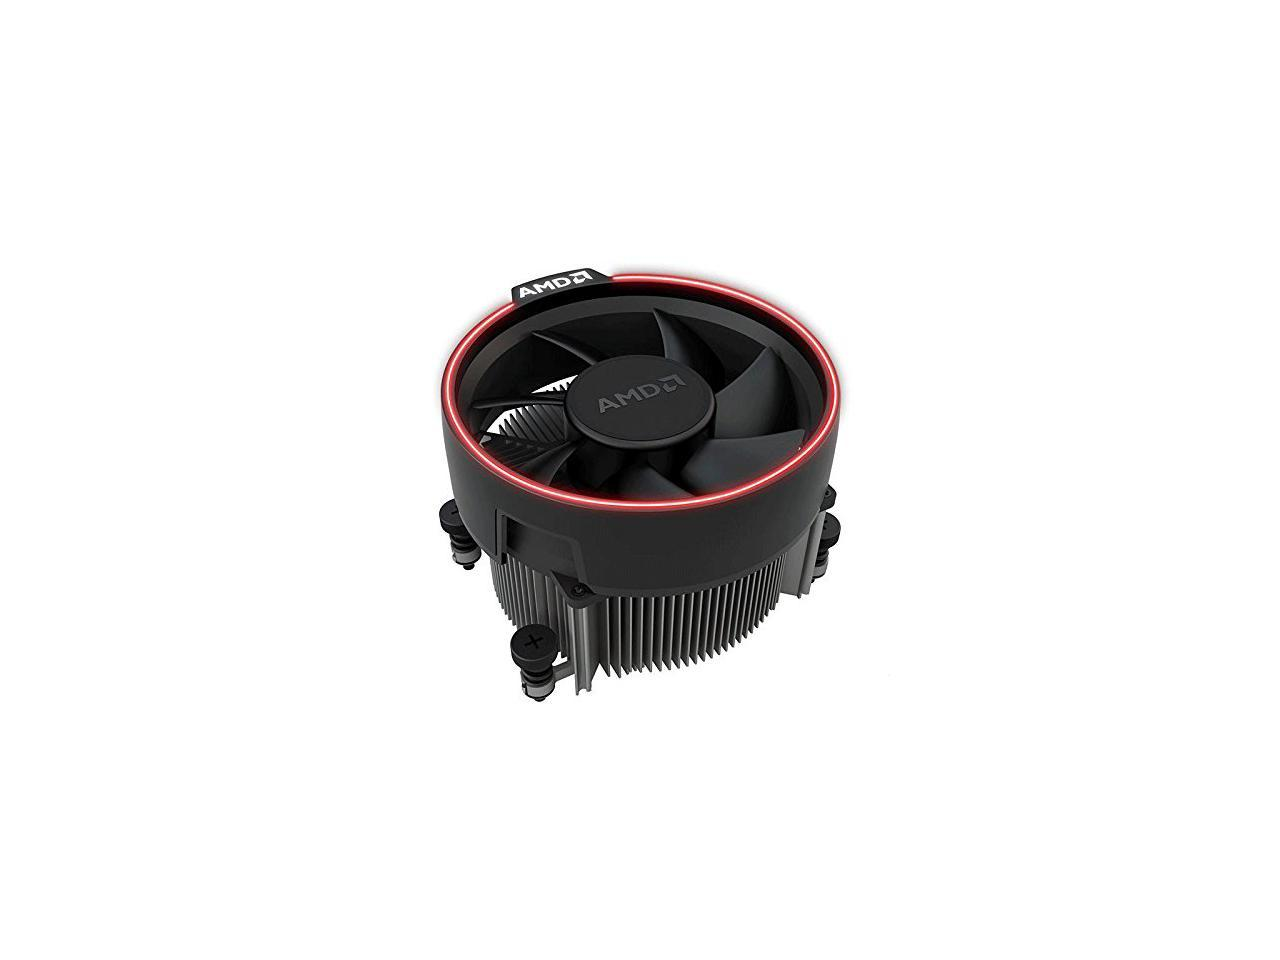 AMD Wraith Spire Socket AM4 4-Pin Connector CPU Cooler With Copper Core Base /& Aluminum Heatsink /& 3.81-Inch Fan